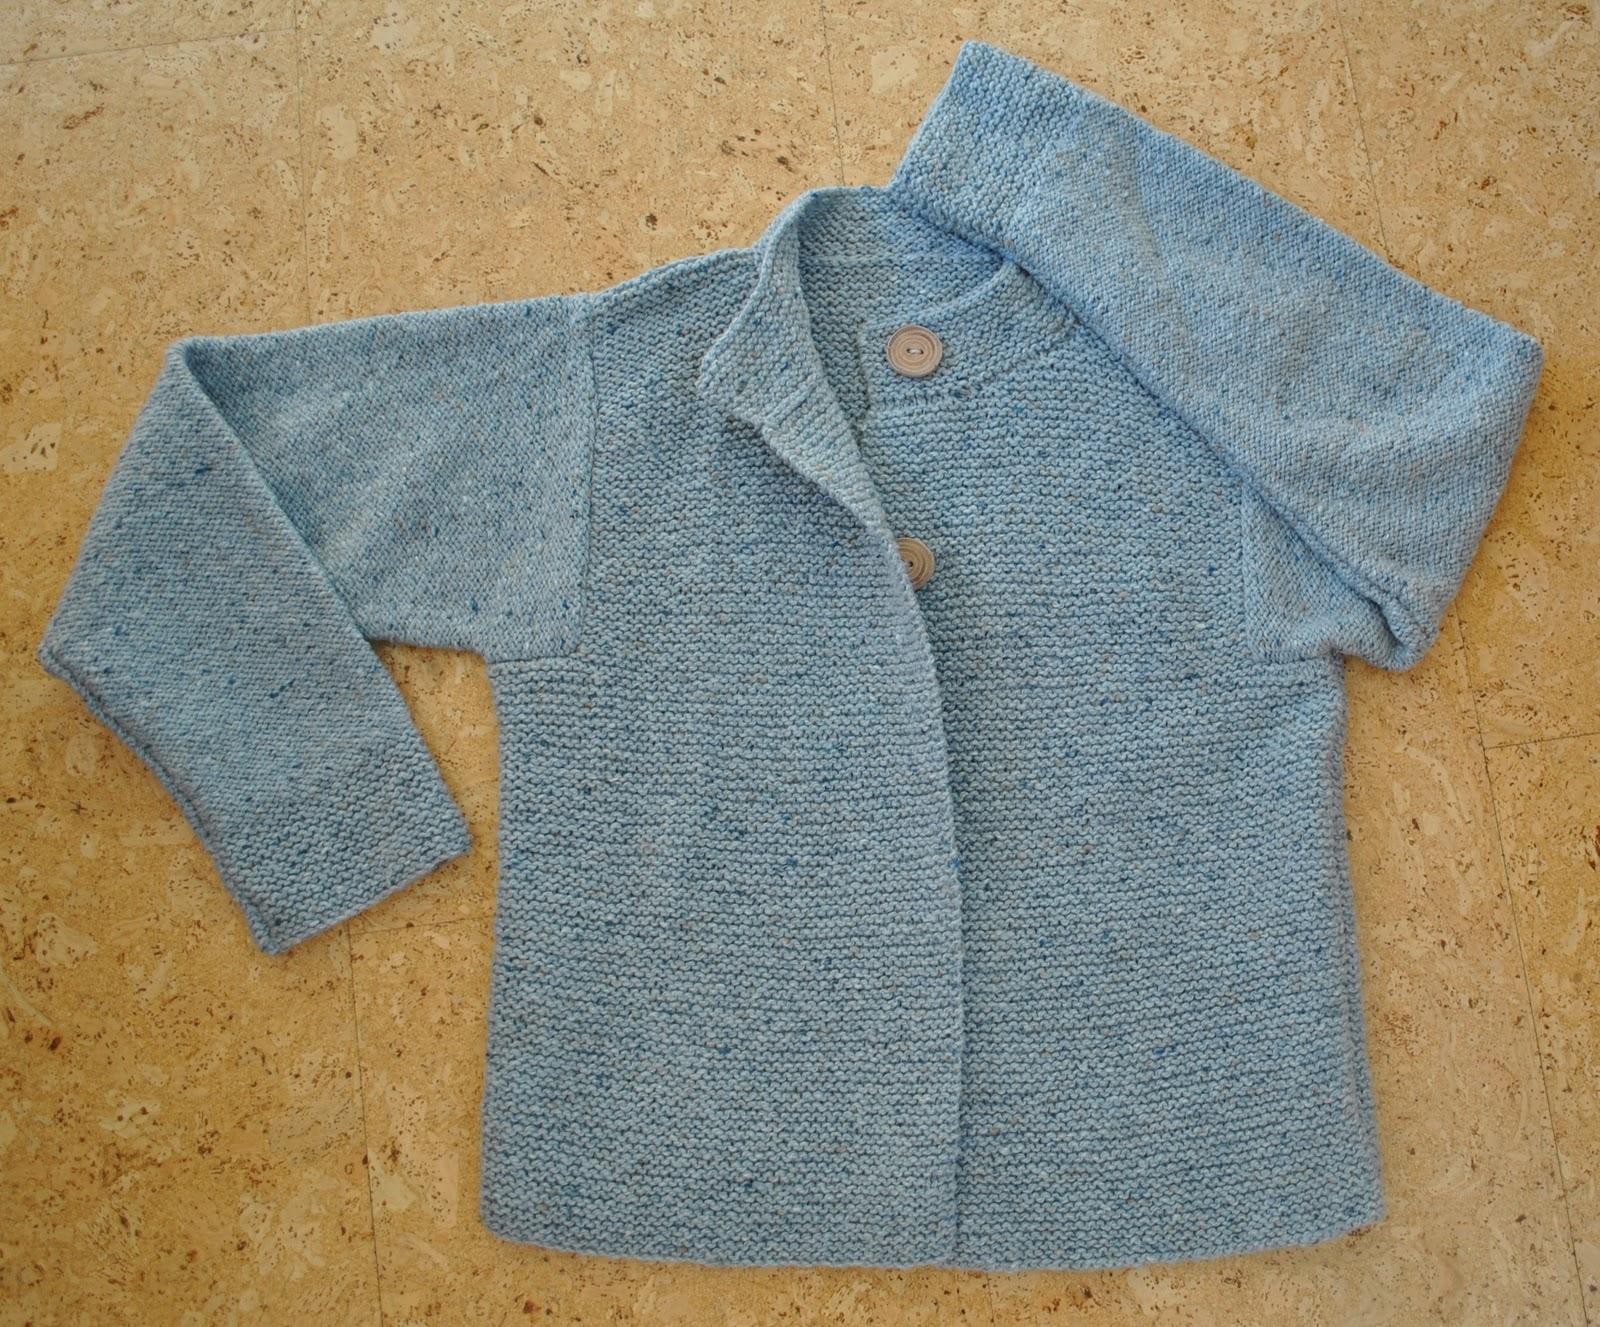 Iceberg garter-stitch jacket - Handmade by Carolyn